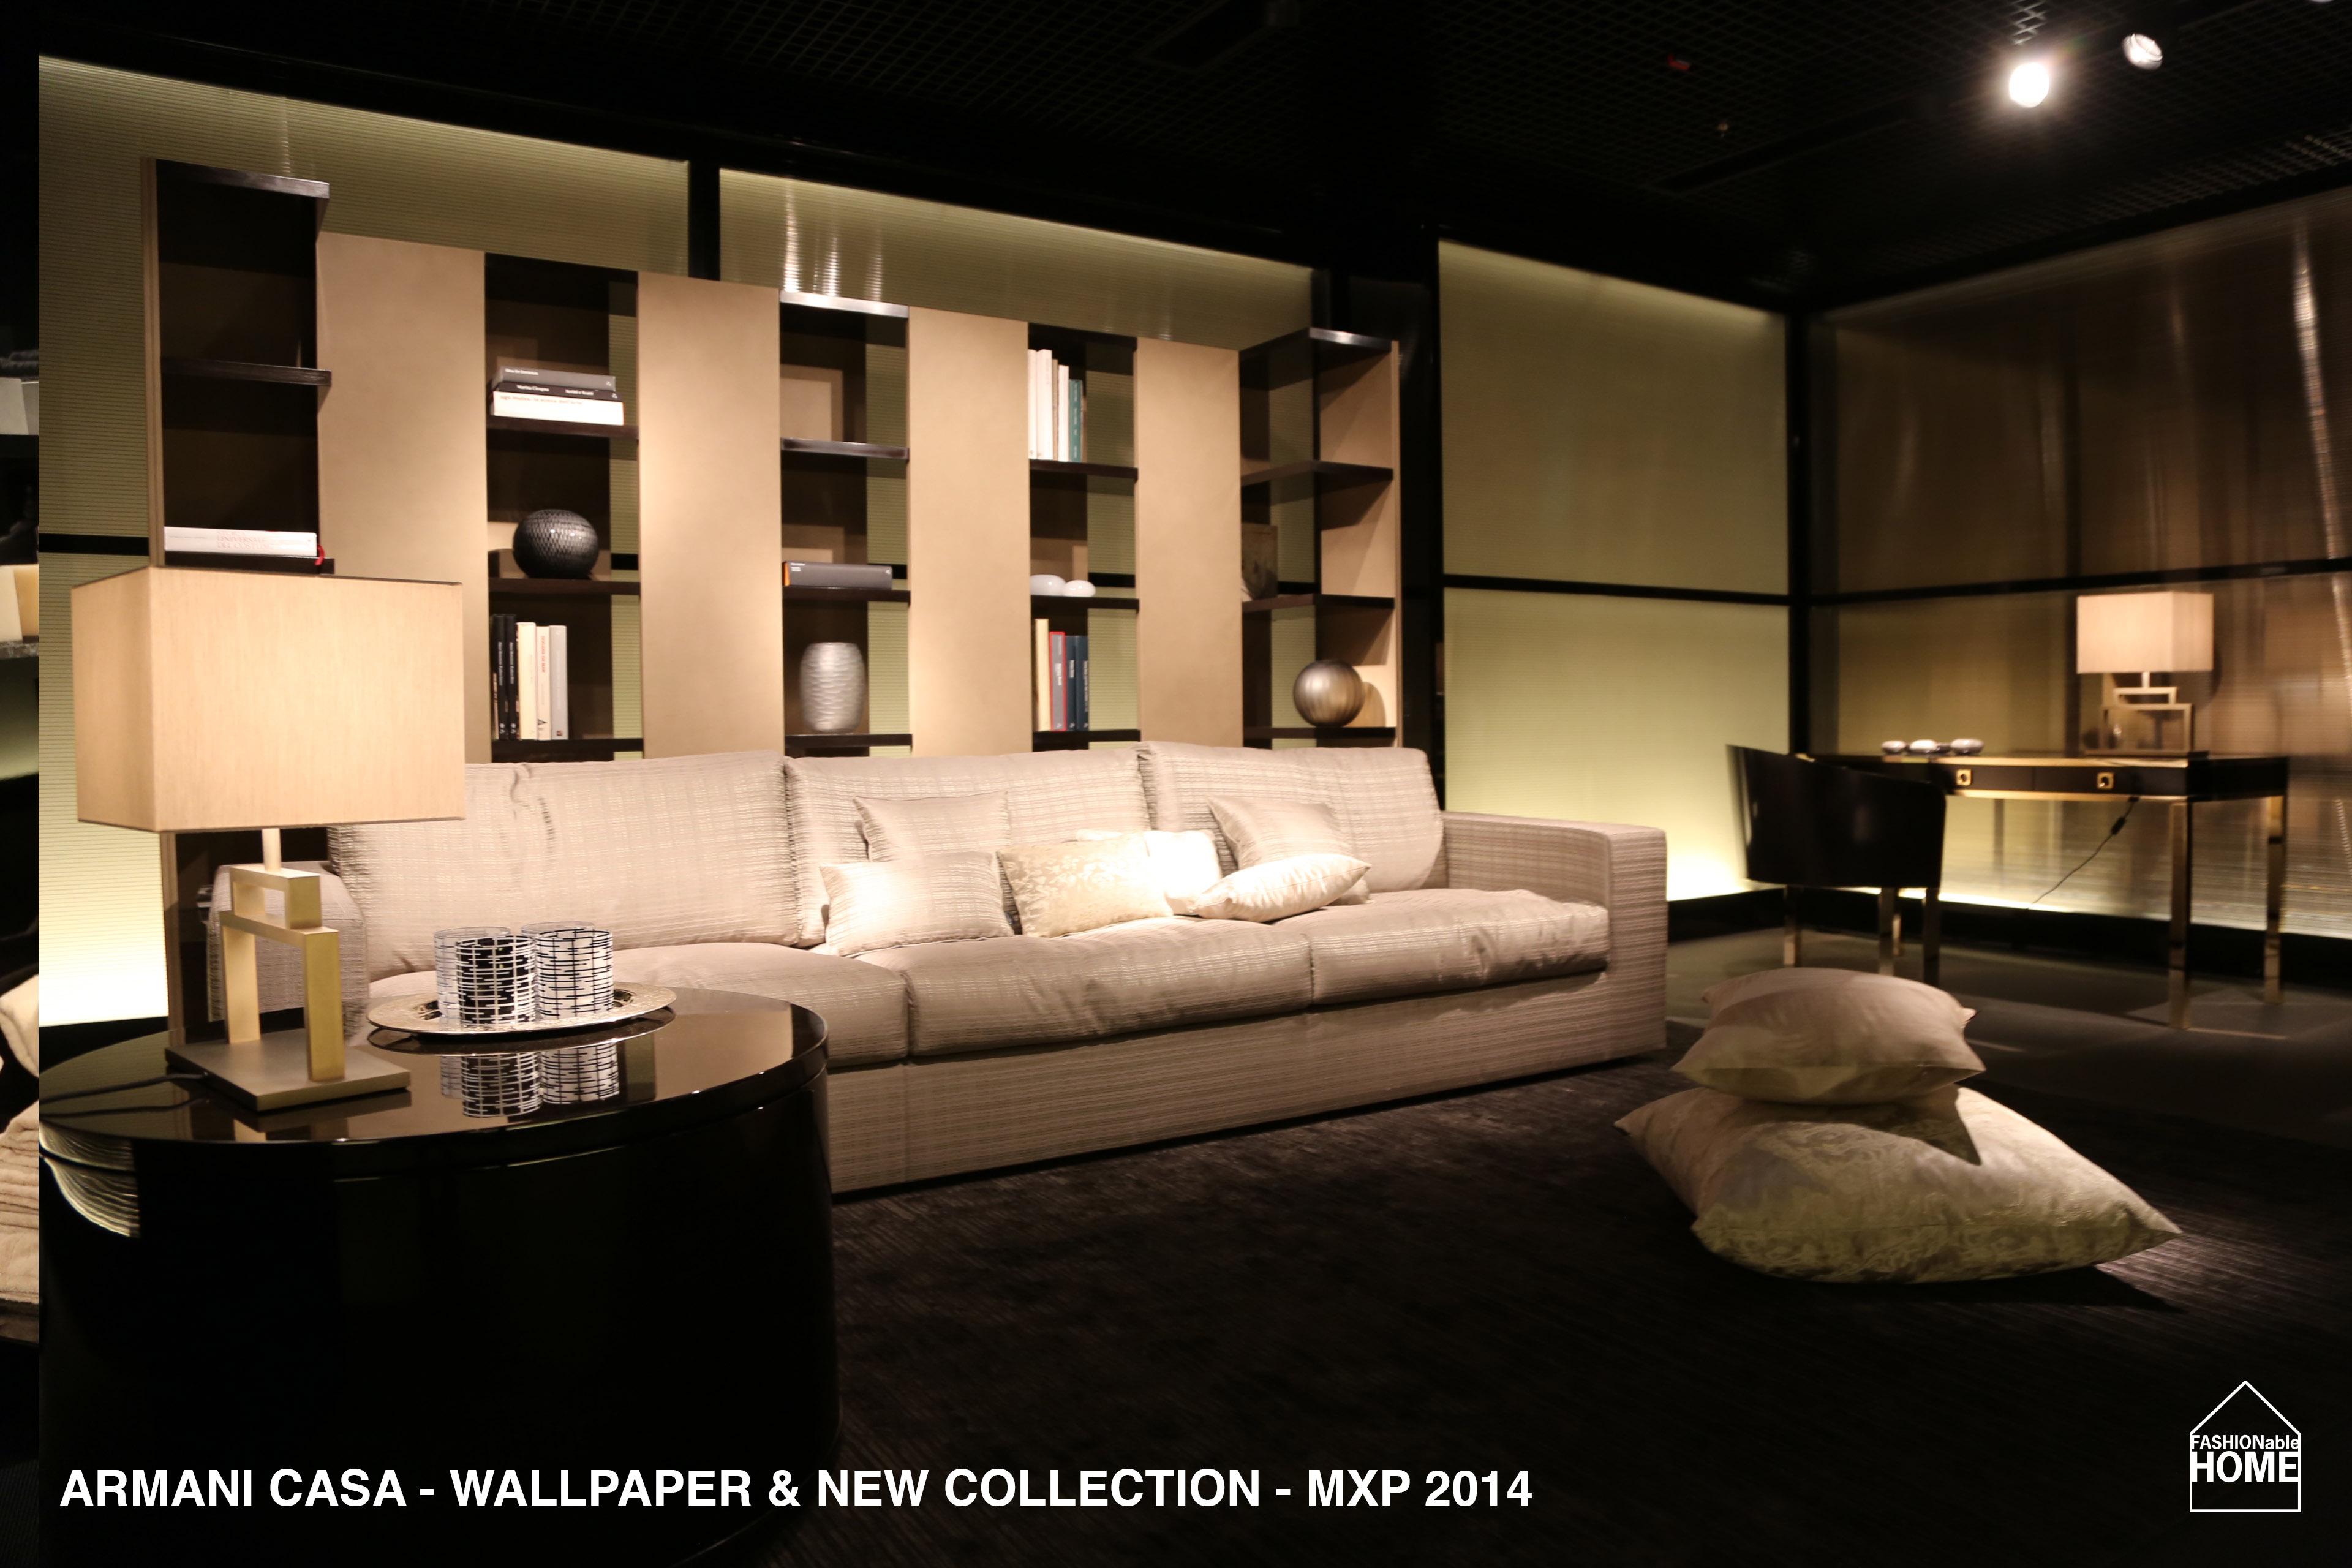 new armani casa wallpapers u0026 collection items milano 2014